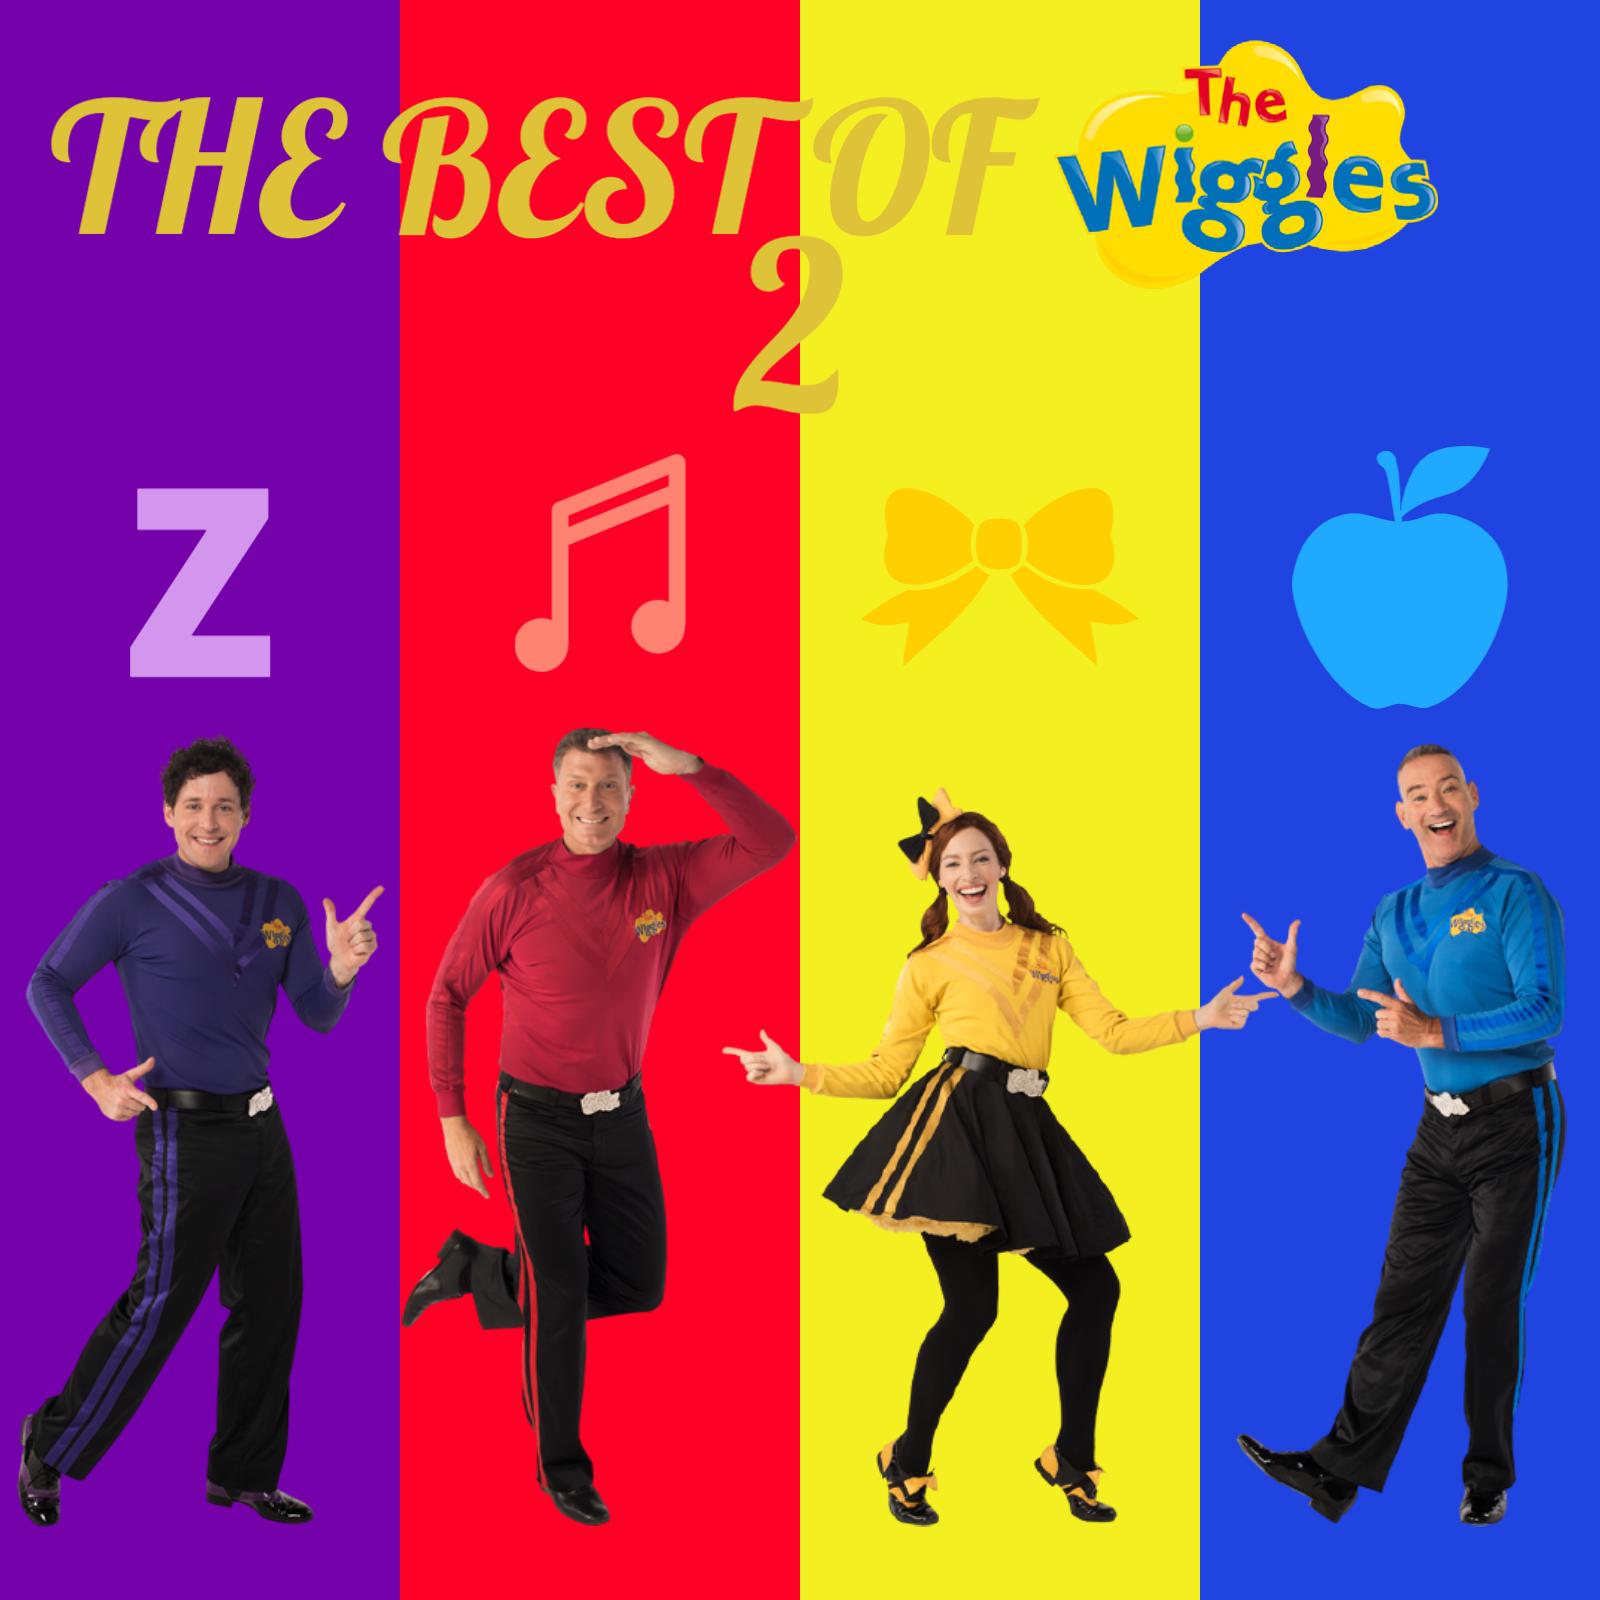 Wigglepedia Fanon: The Best of The Wiggles 2 (album)